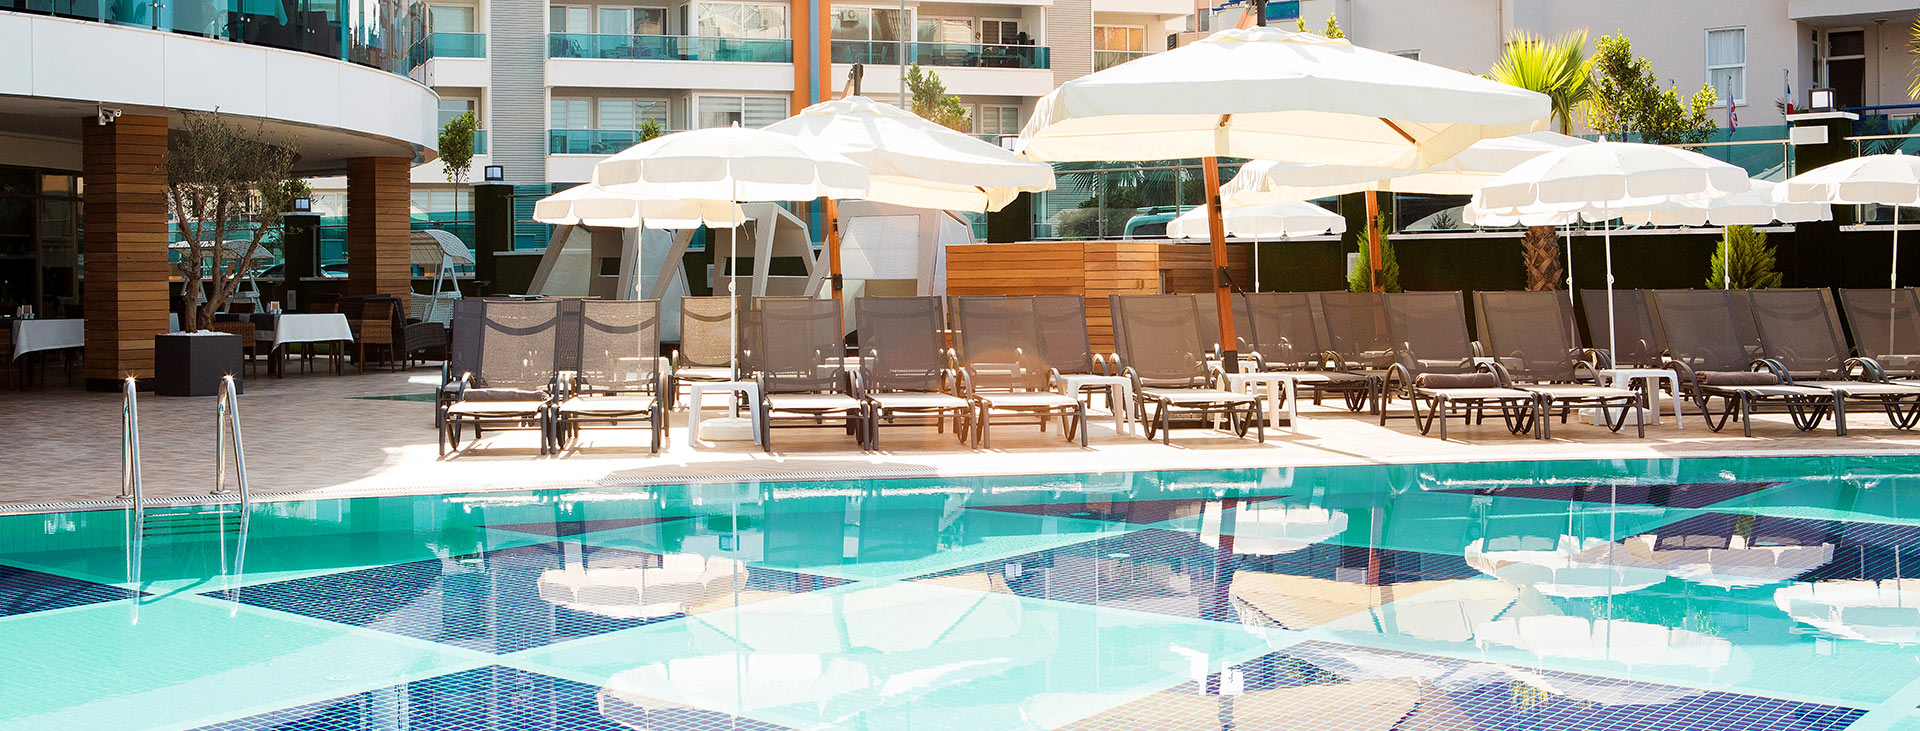 Sunprime C-Lounge, Alanya, Antalyan alue, Turkki